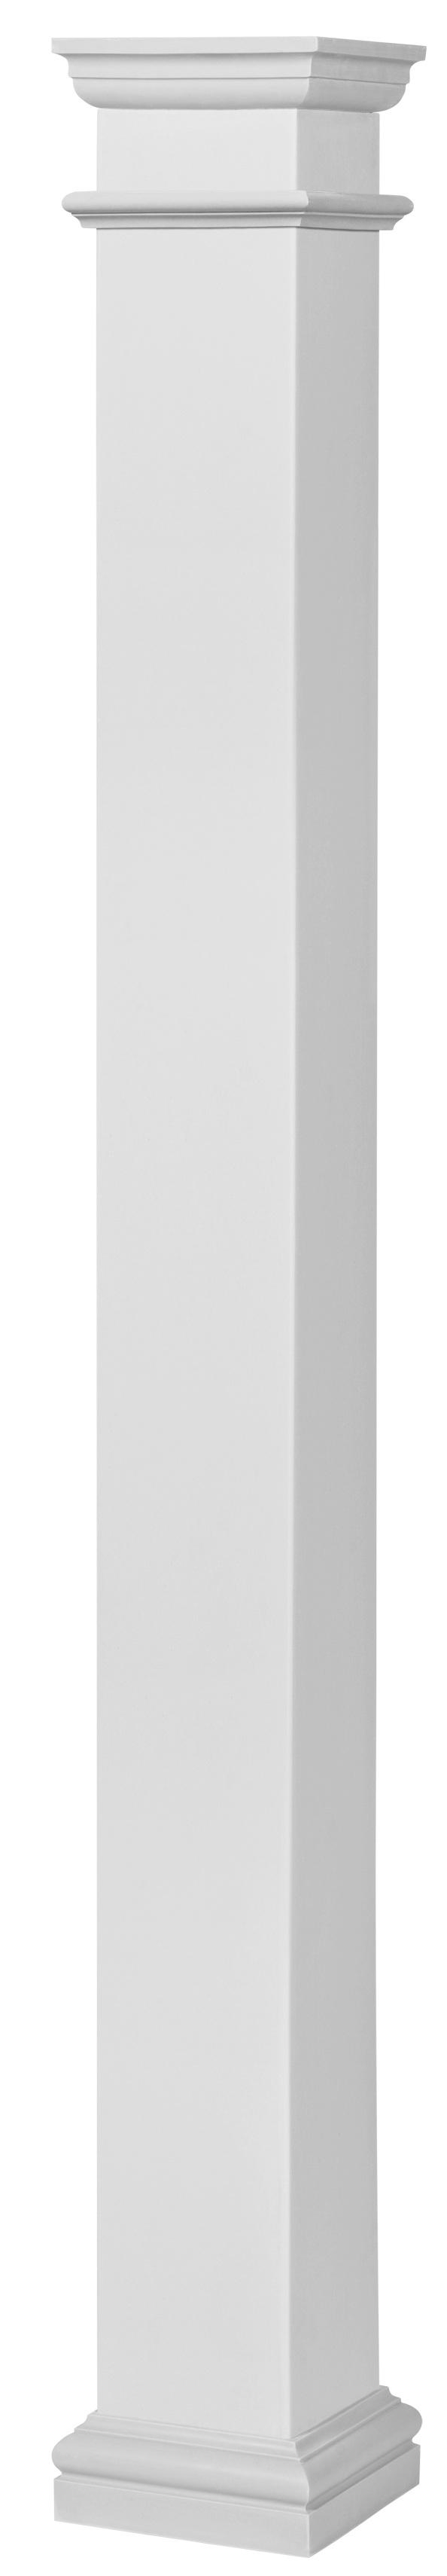 SS-TuscanCapTuscanBase-Angle-BN.jpg